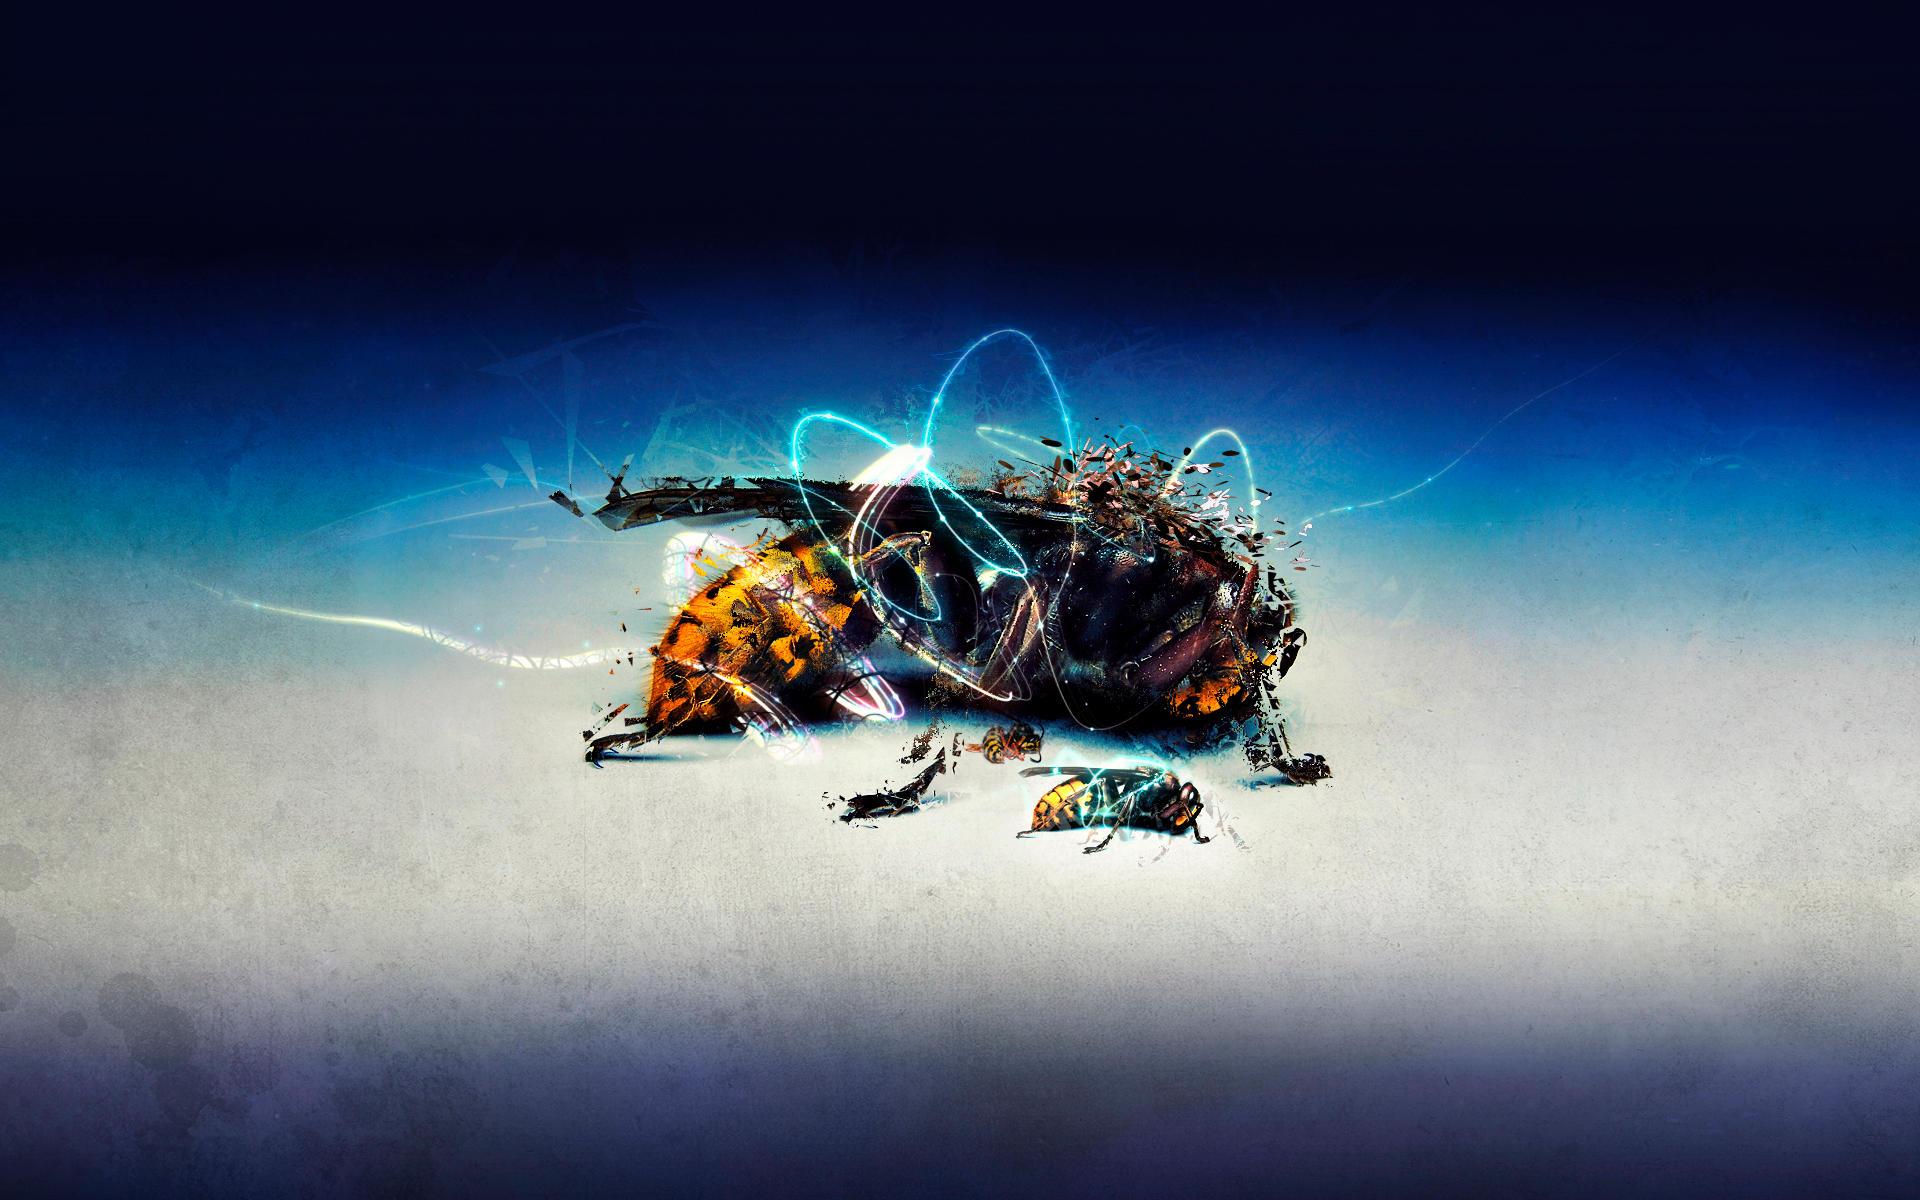 Dead wasp by Psychopulse